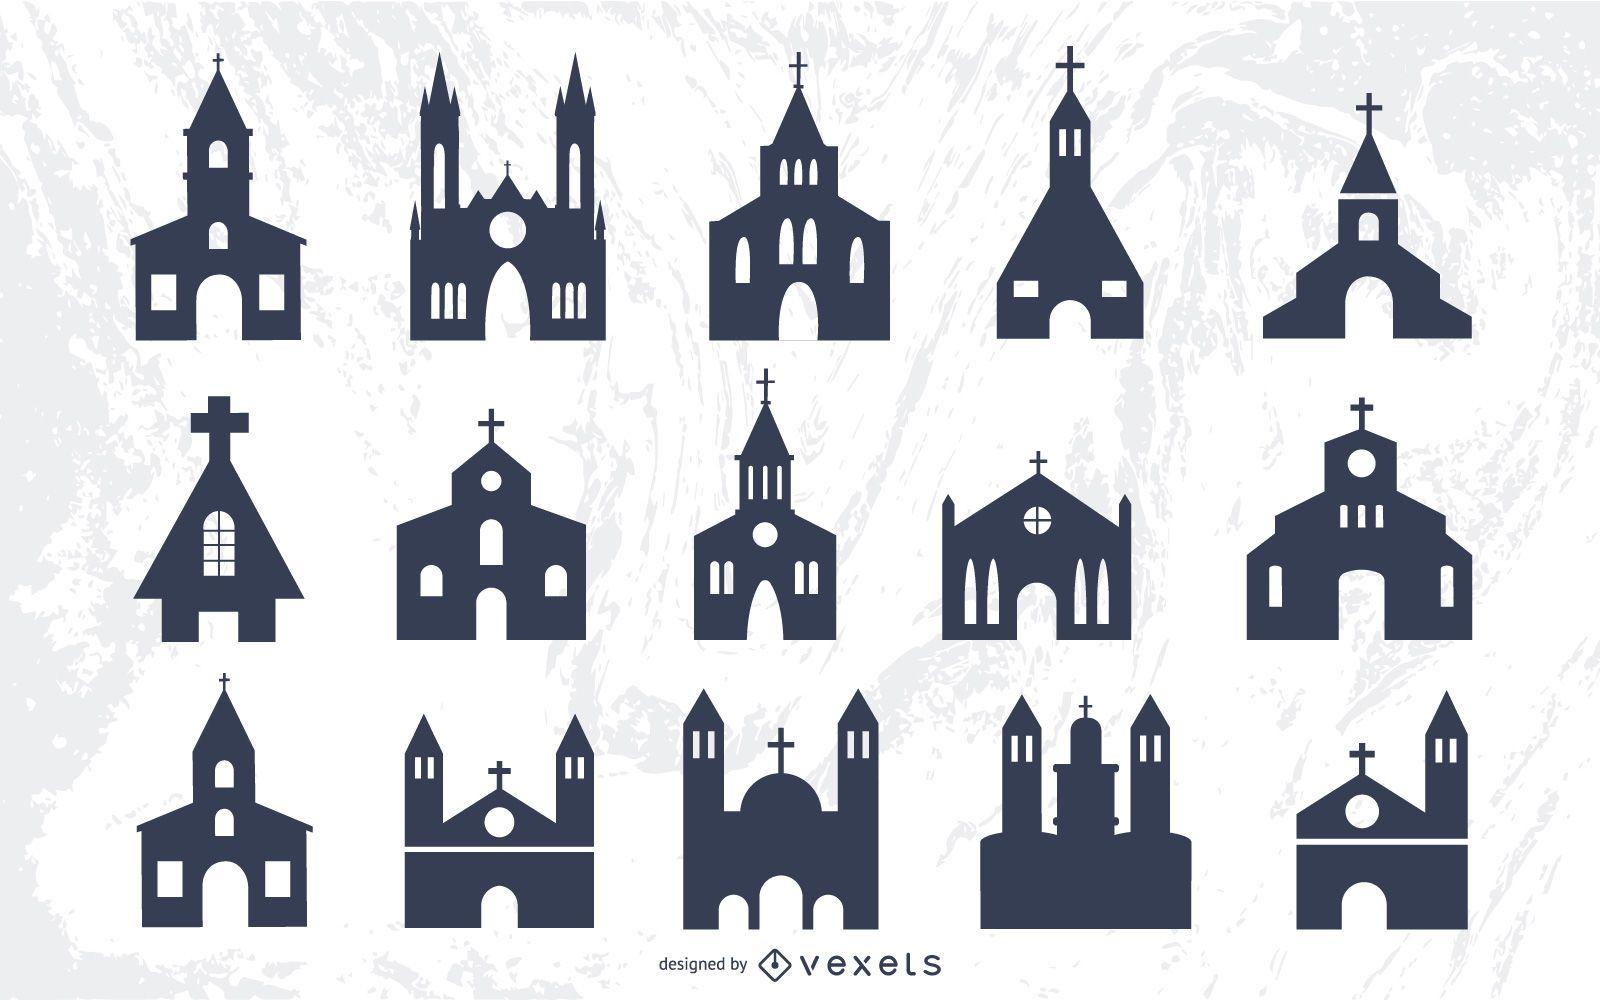 Silhouette Religion Architect of Churches